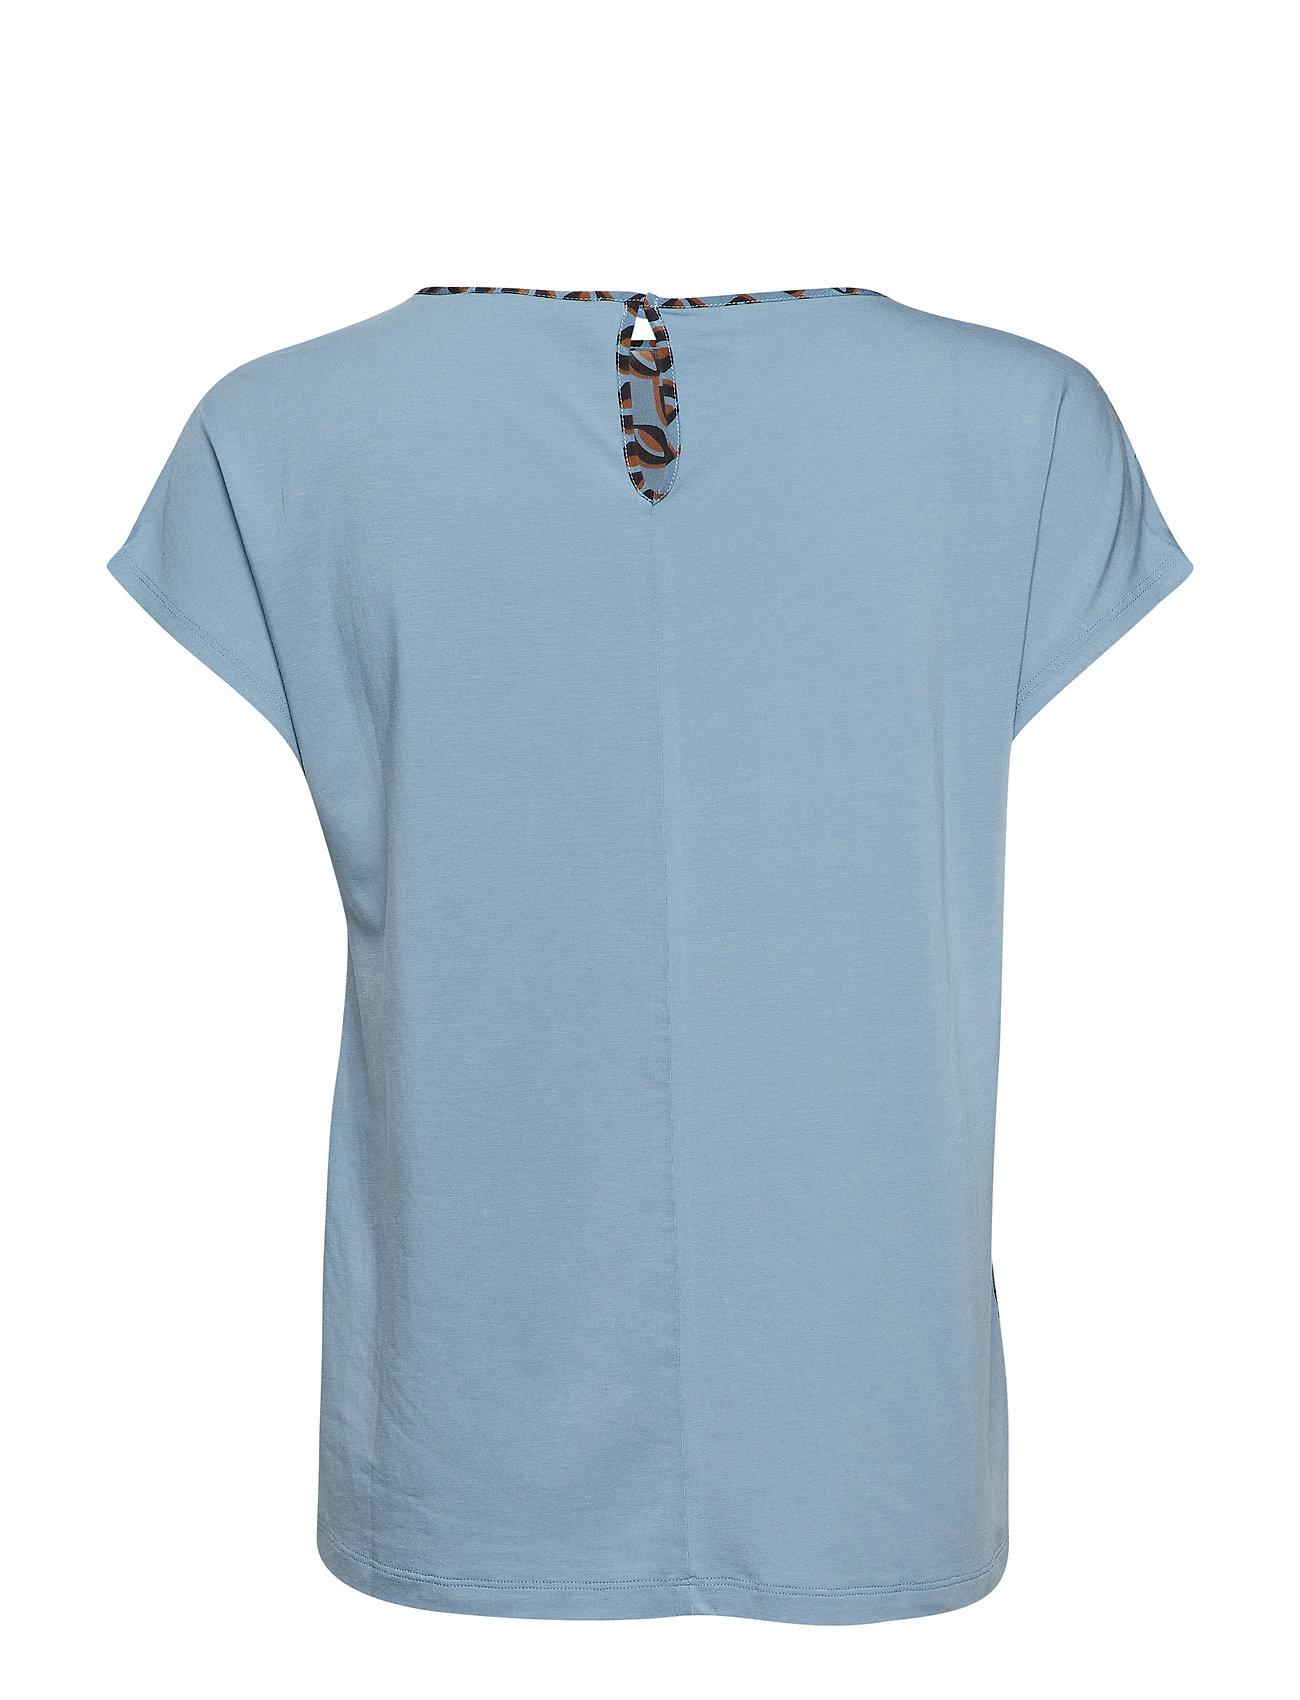 WEEKEND MAX MARA Emy T-Shirt Top Bunt/gemustert WEEKEND MAX MARA